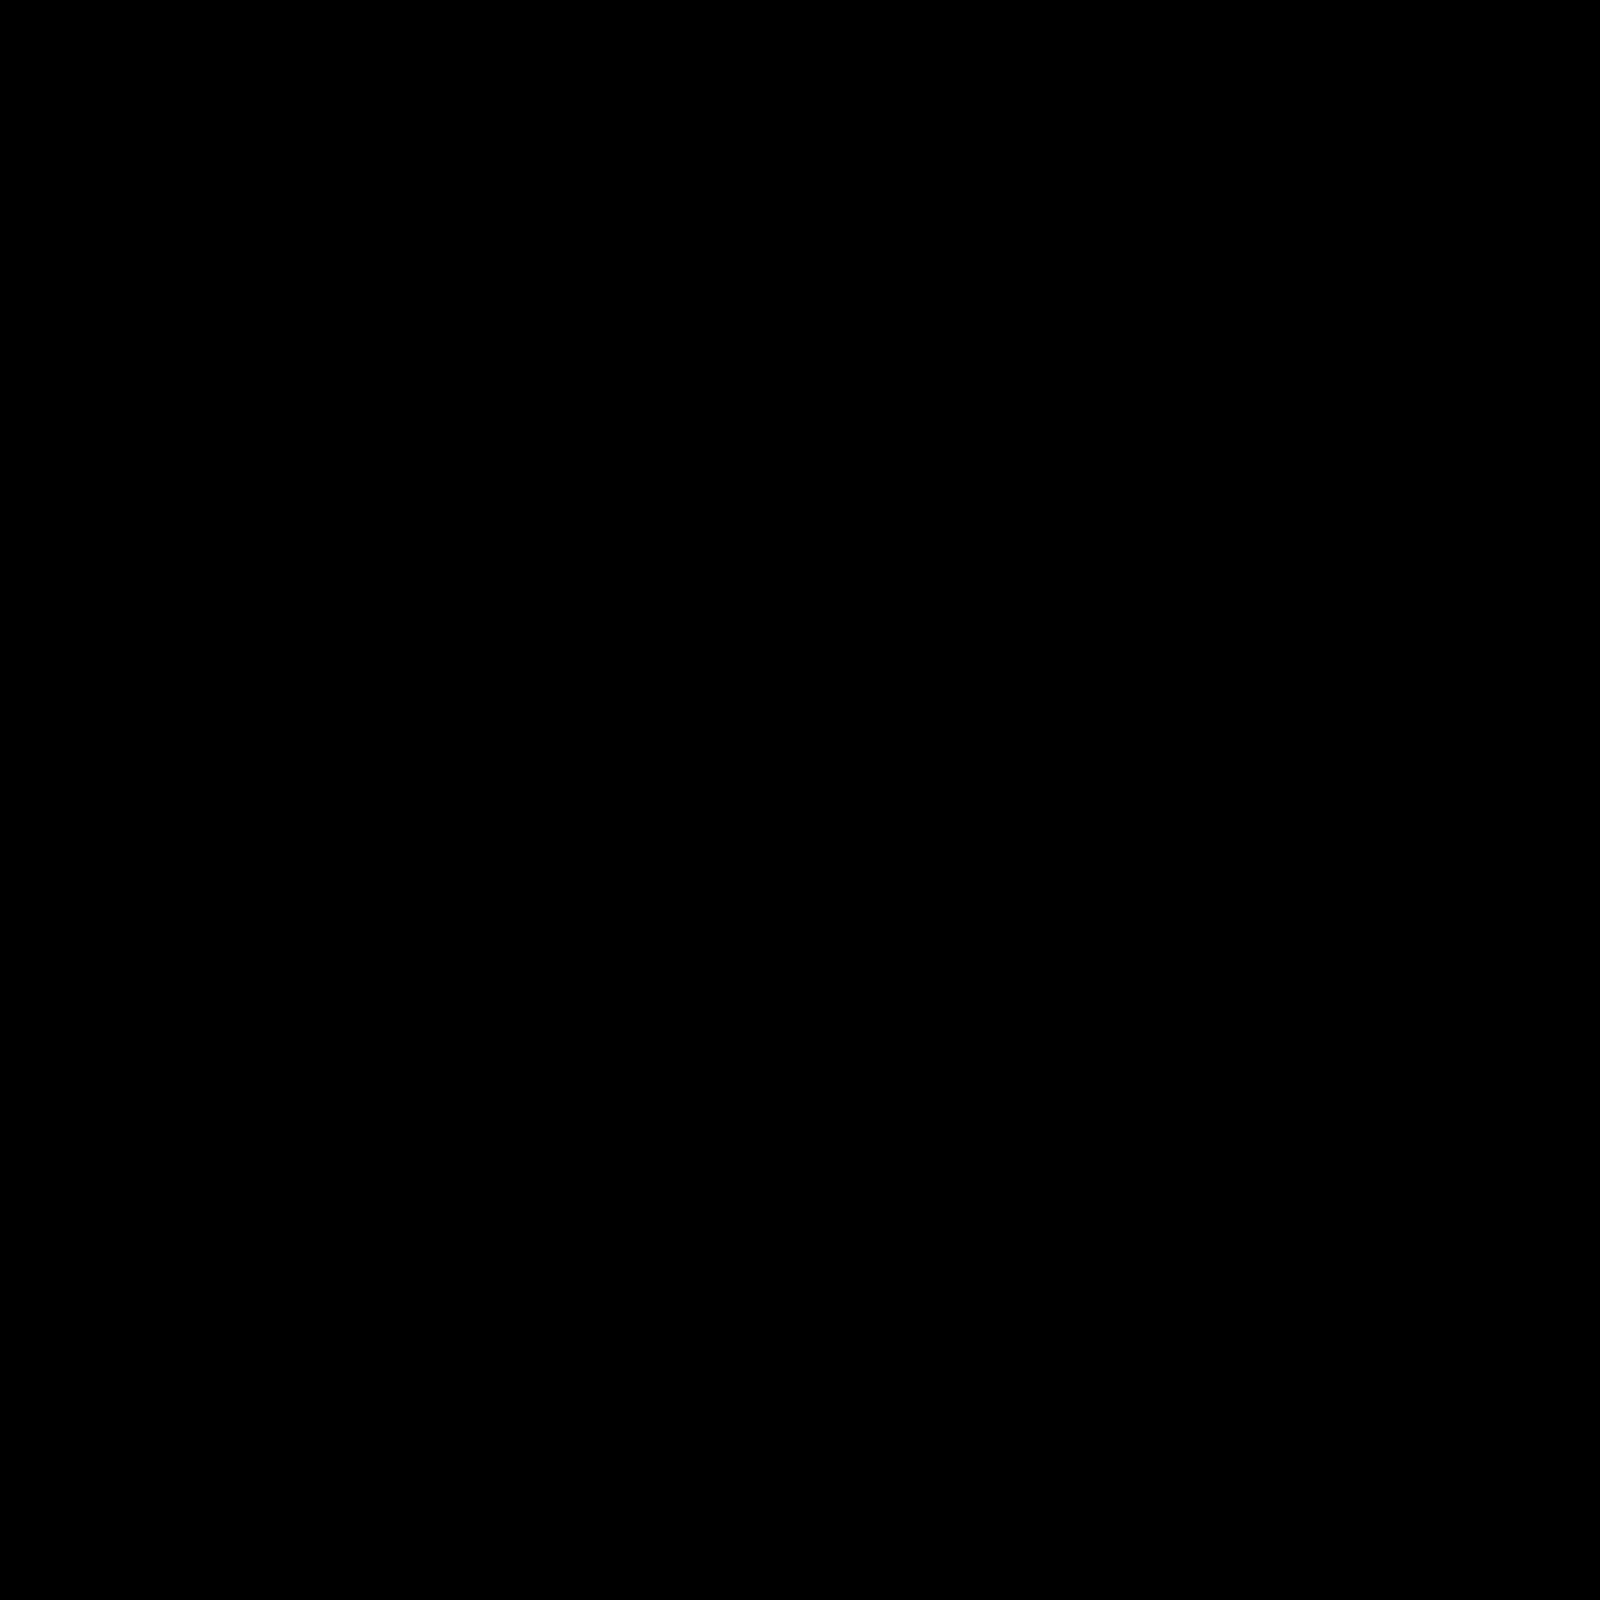 Windows XP icon